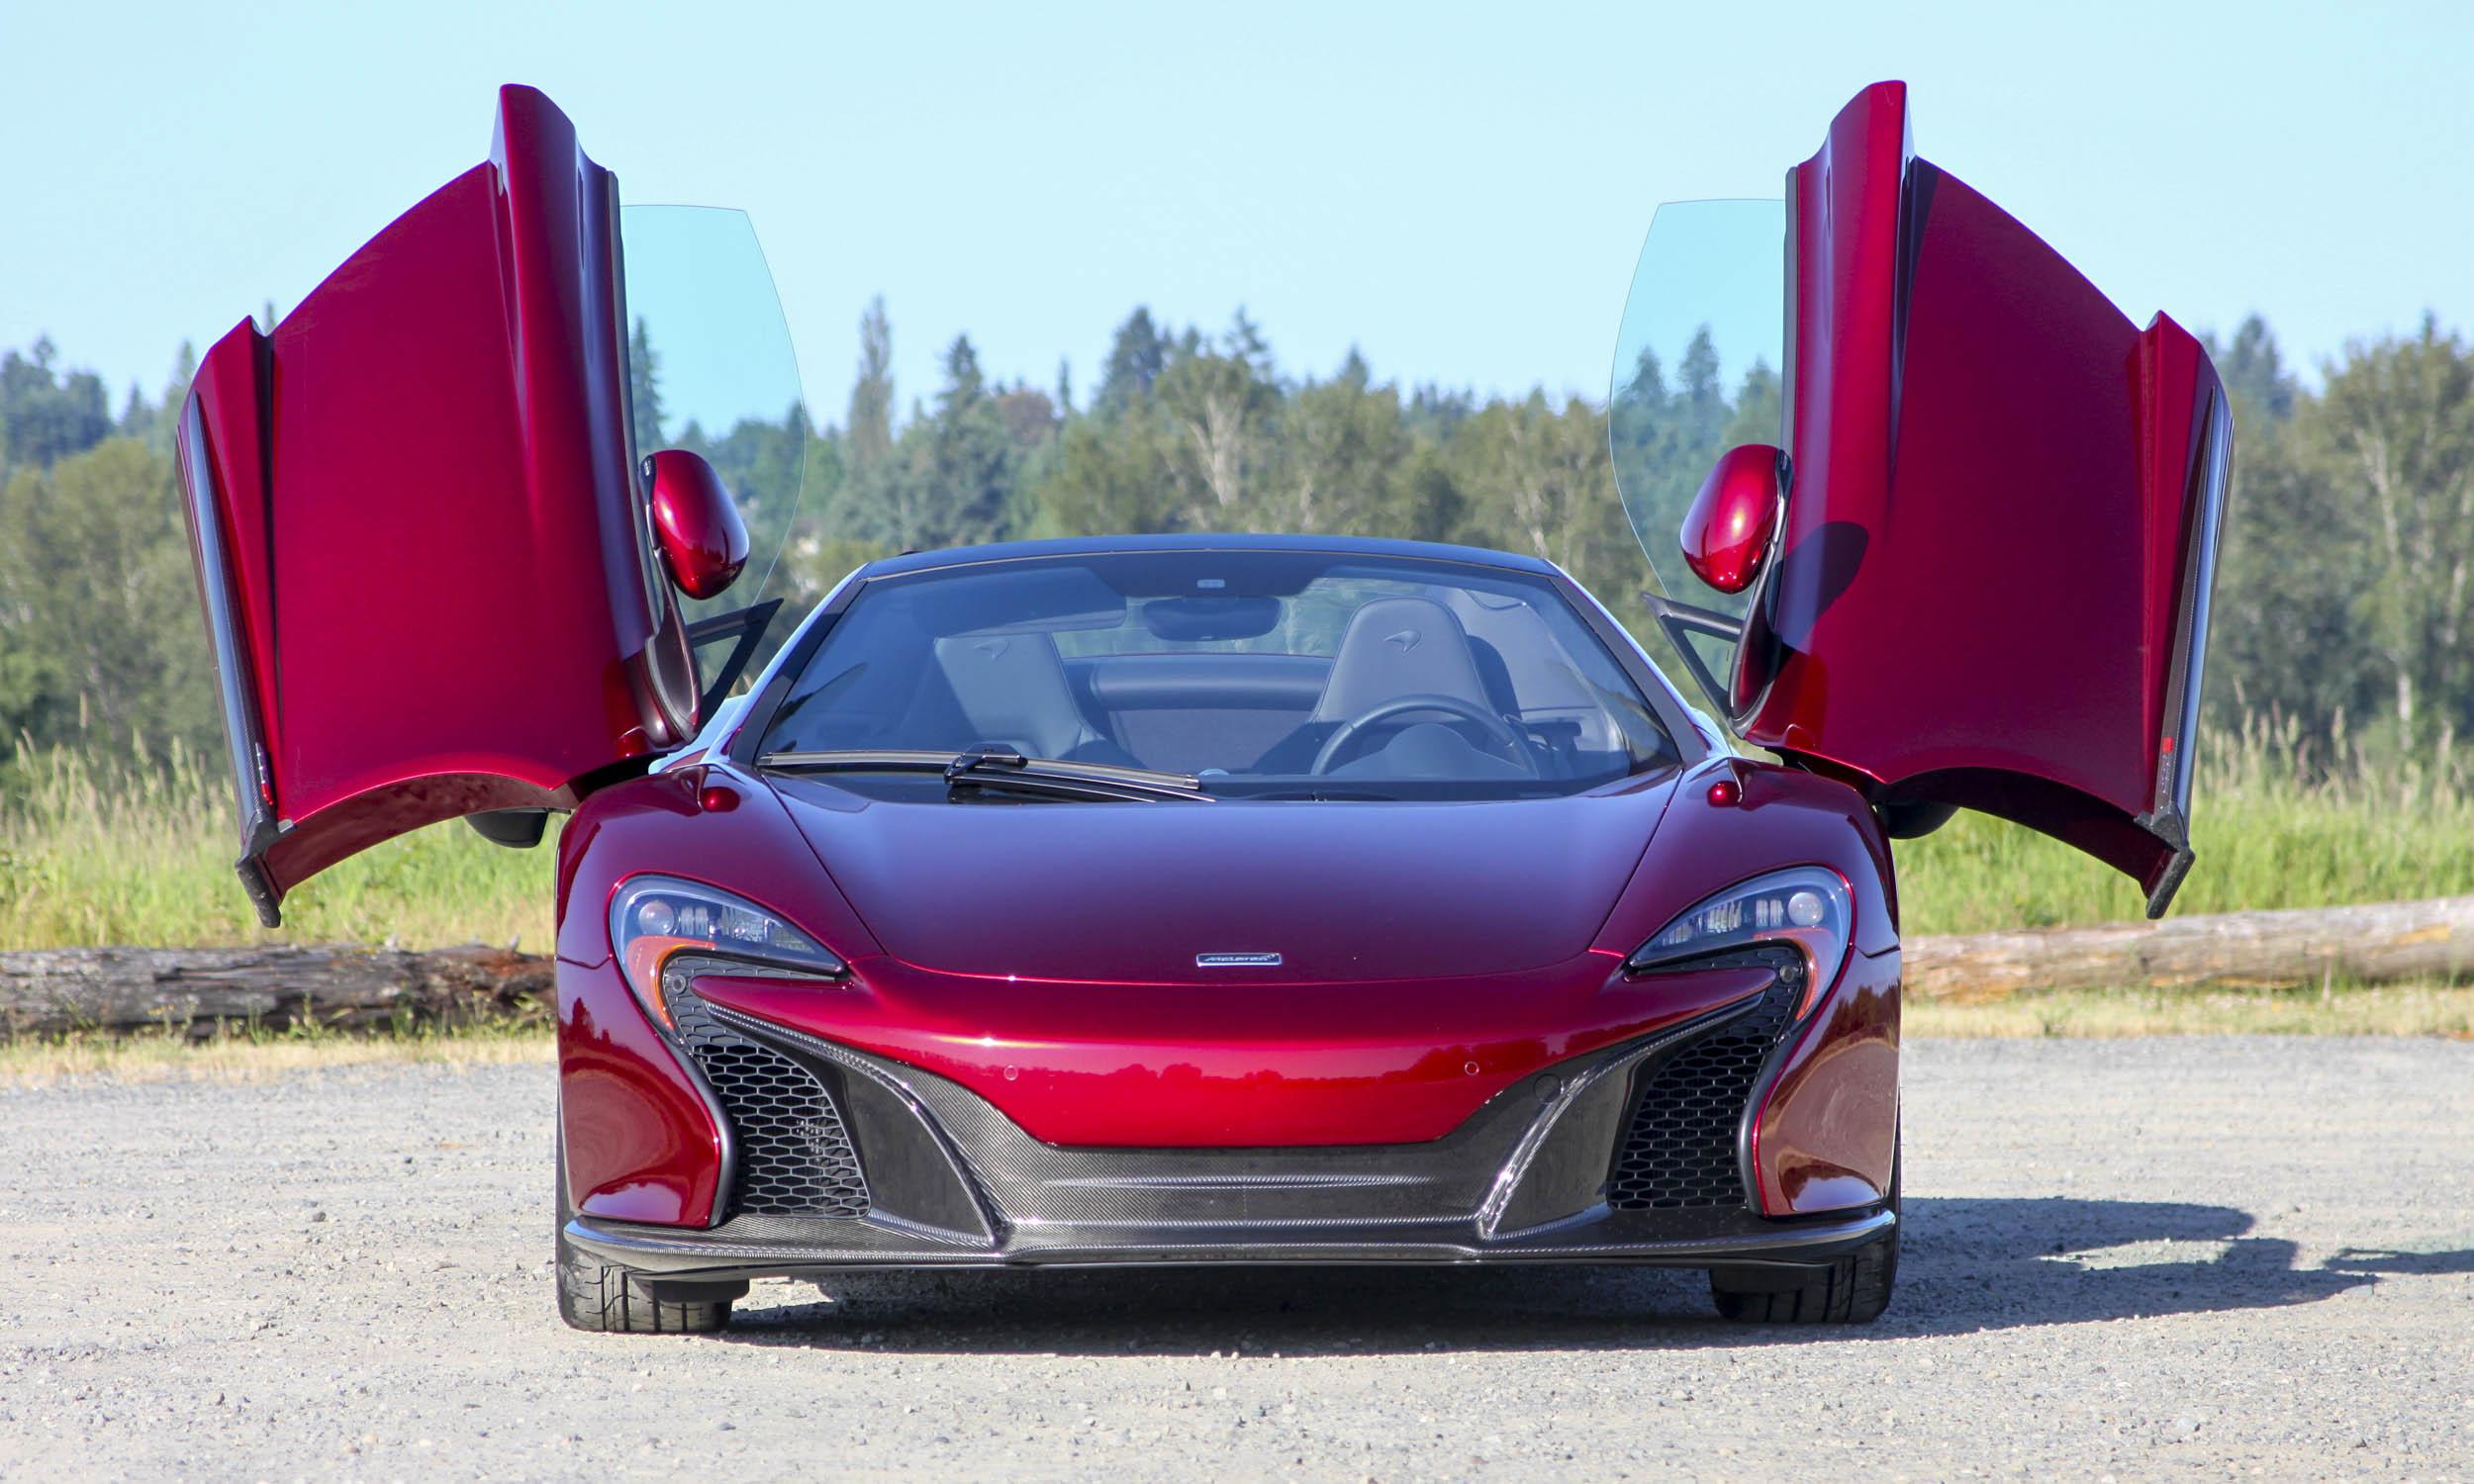 Perry Stern Automotive Content Experience & 2015 McLaren 650S Spider: Review - » AutoNXT